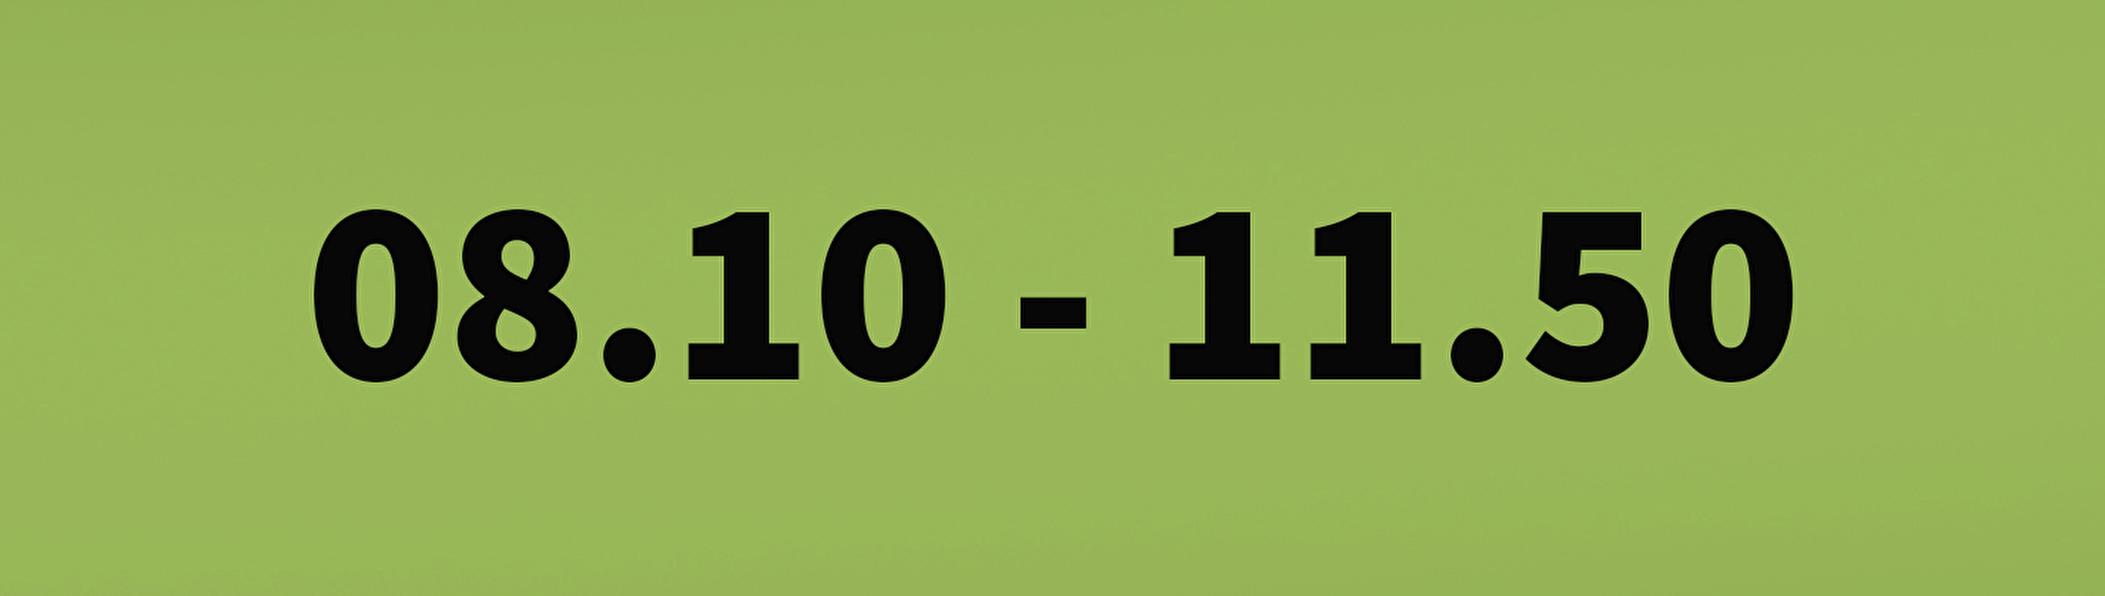 8.10 - 11.50